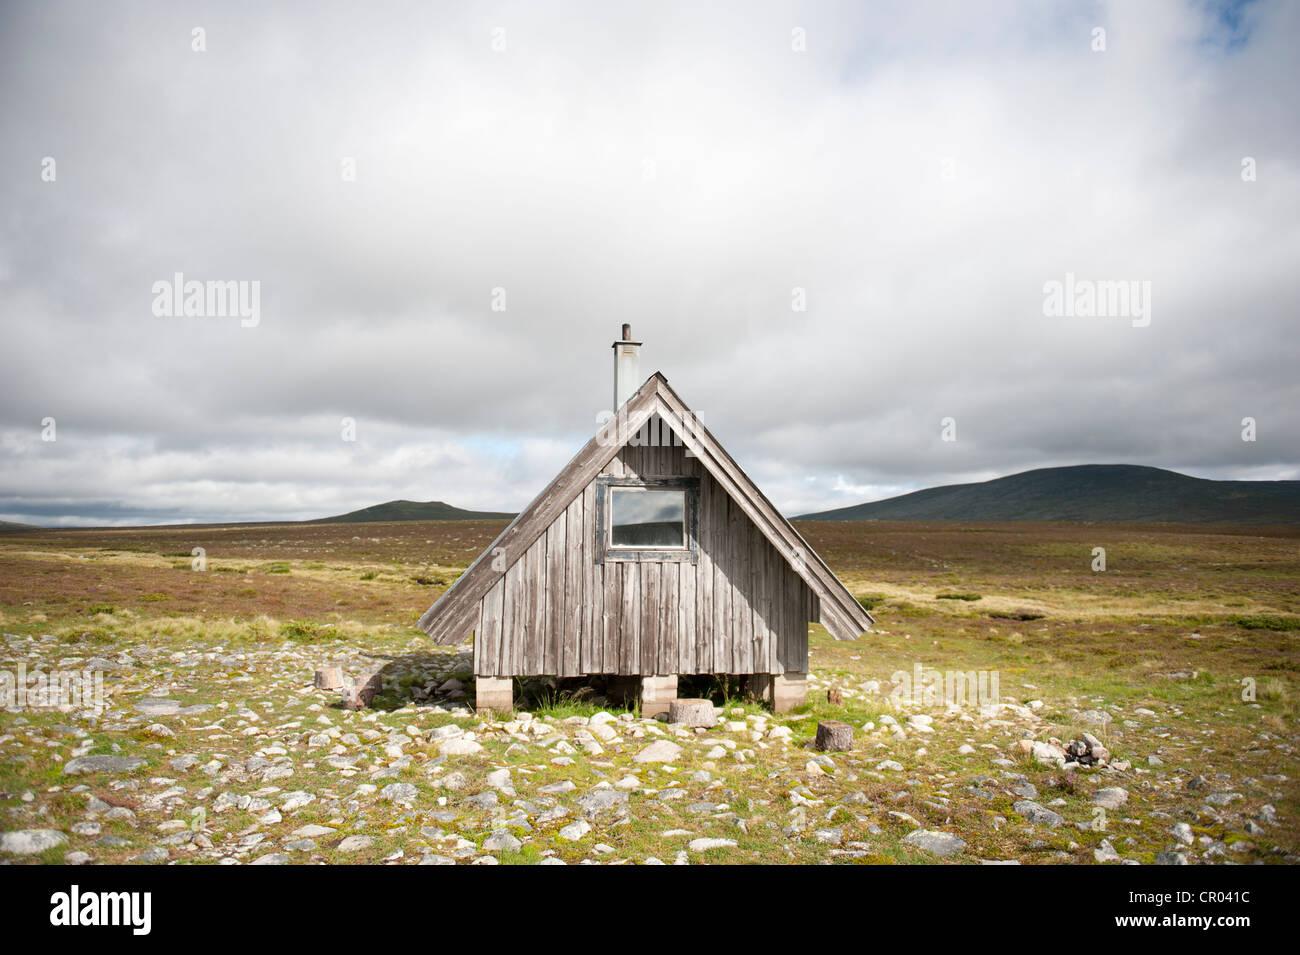 Holzhütte auf einem baumlosen Plateau, Fjaell, Oskarsstugan in der Nähe von Groevelsjoen, Dalarna Provinz, Stockbild